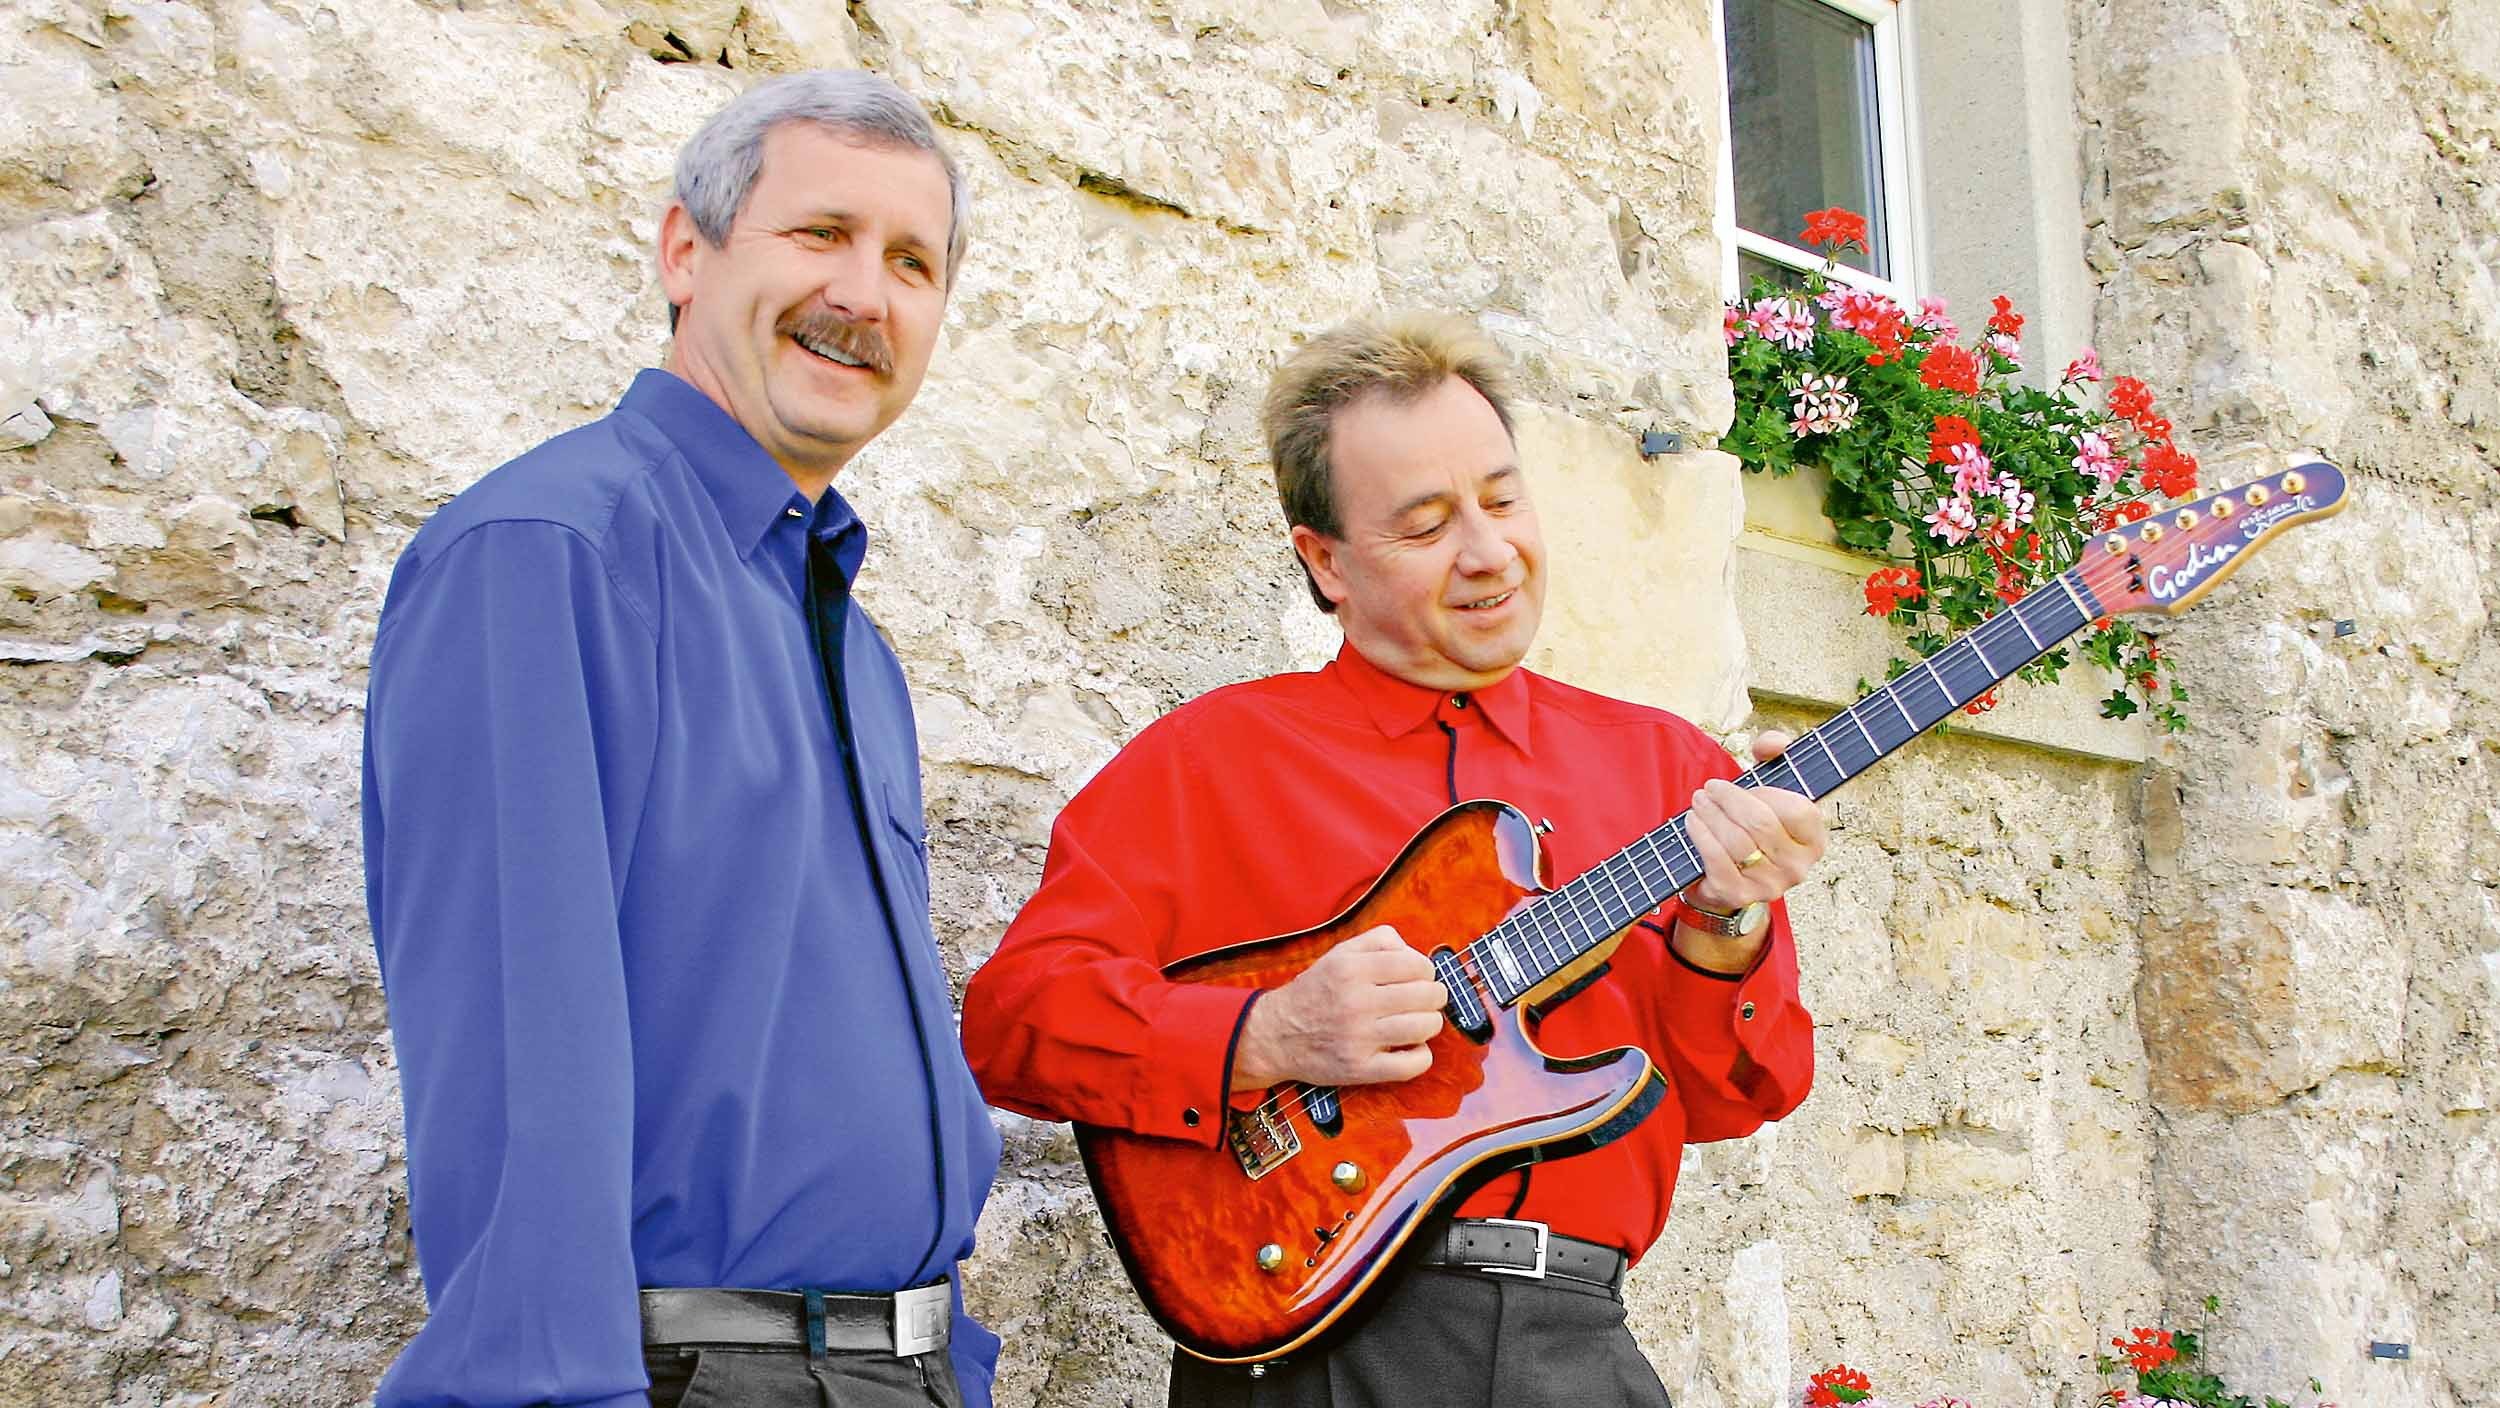 Peter&Peter: Demosongs